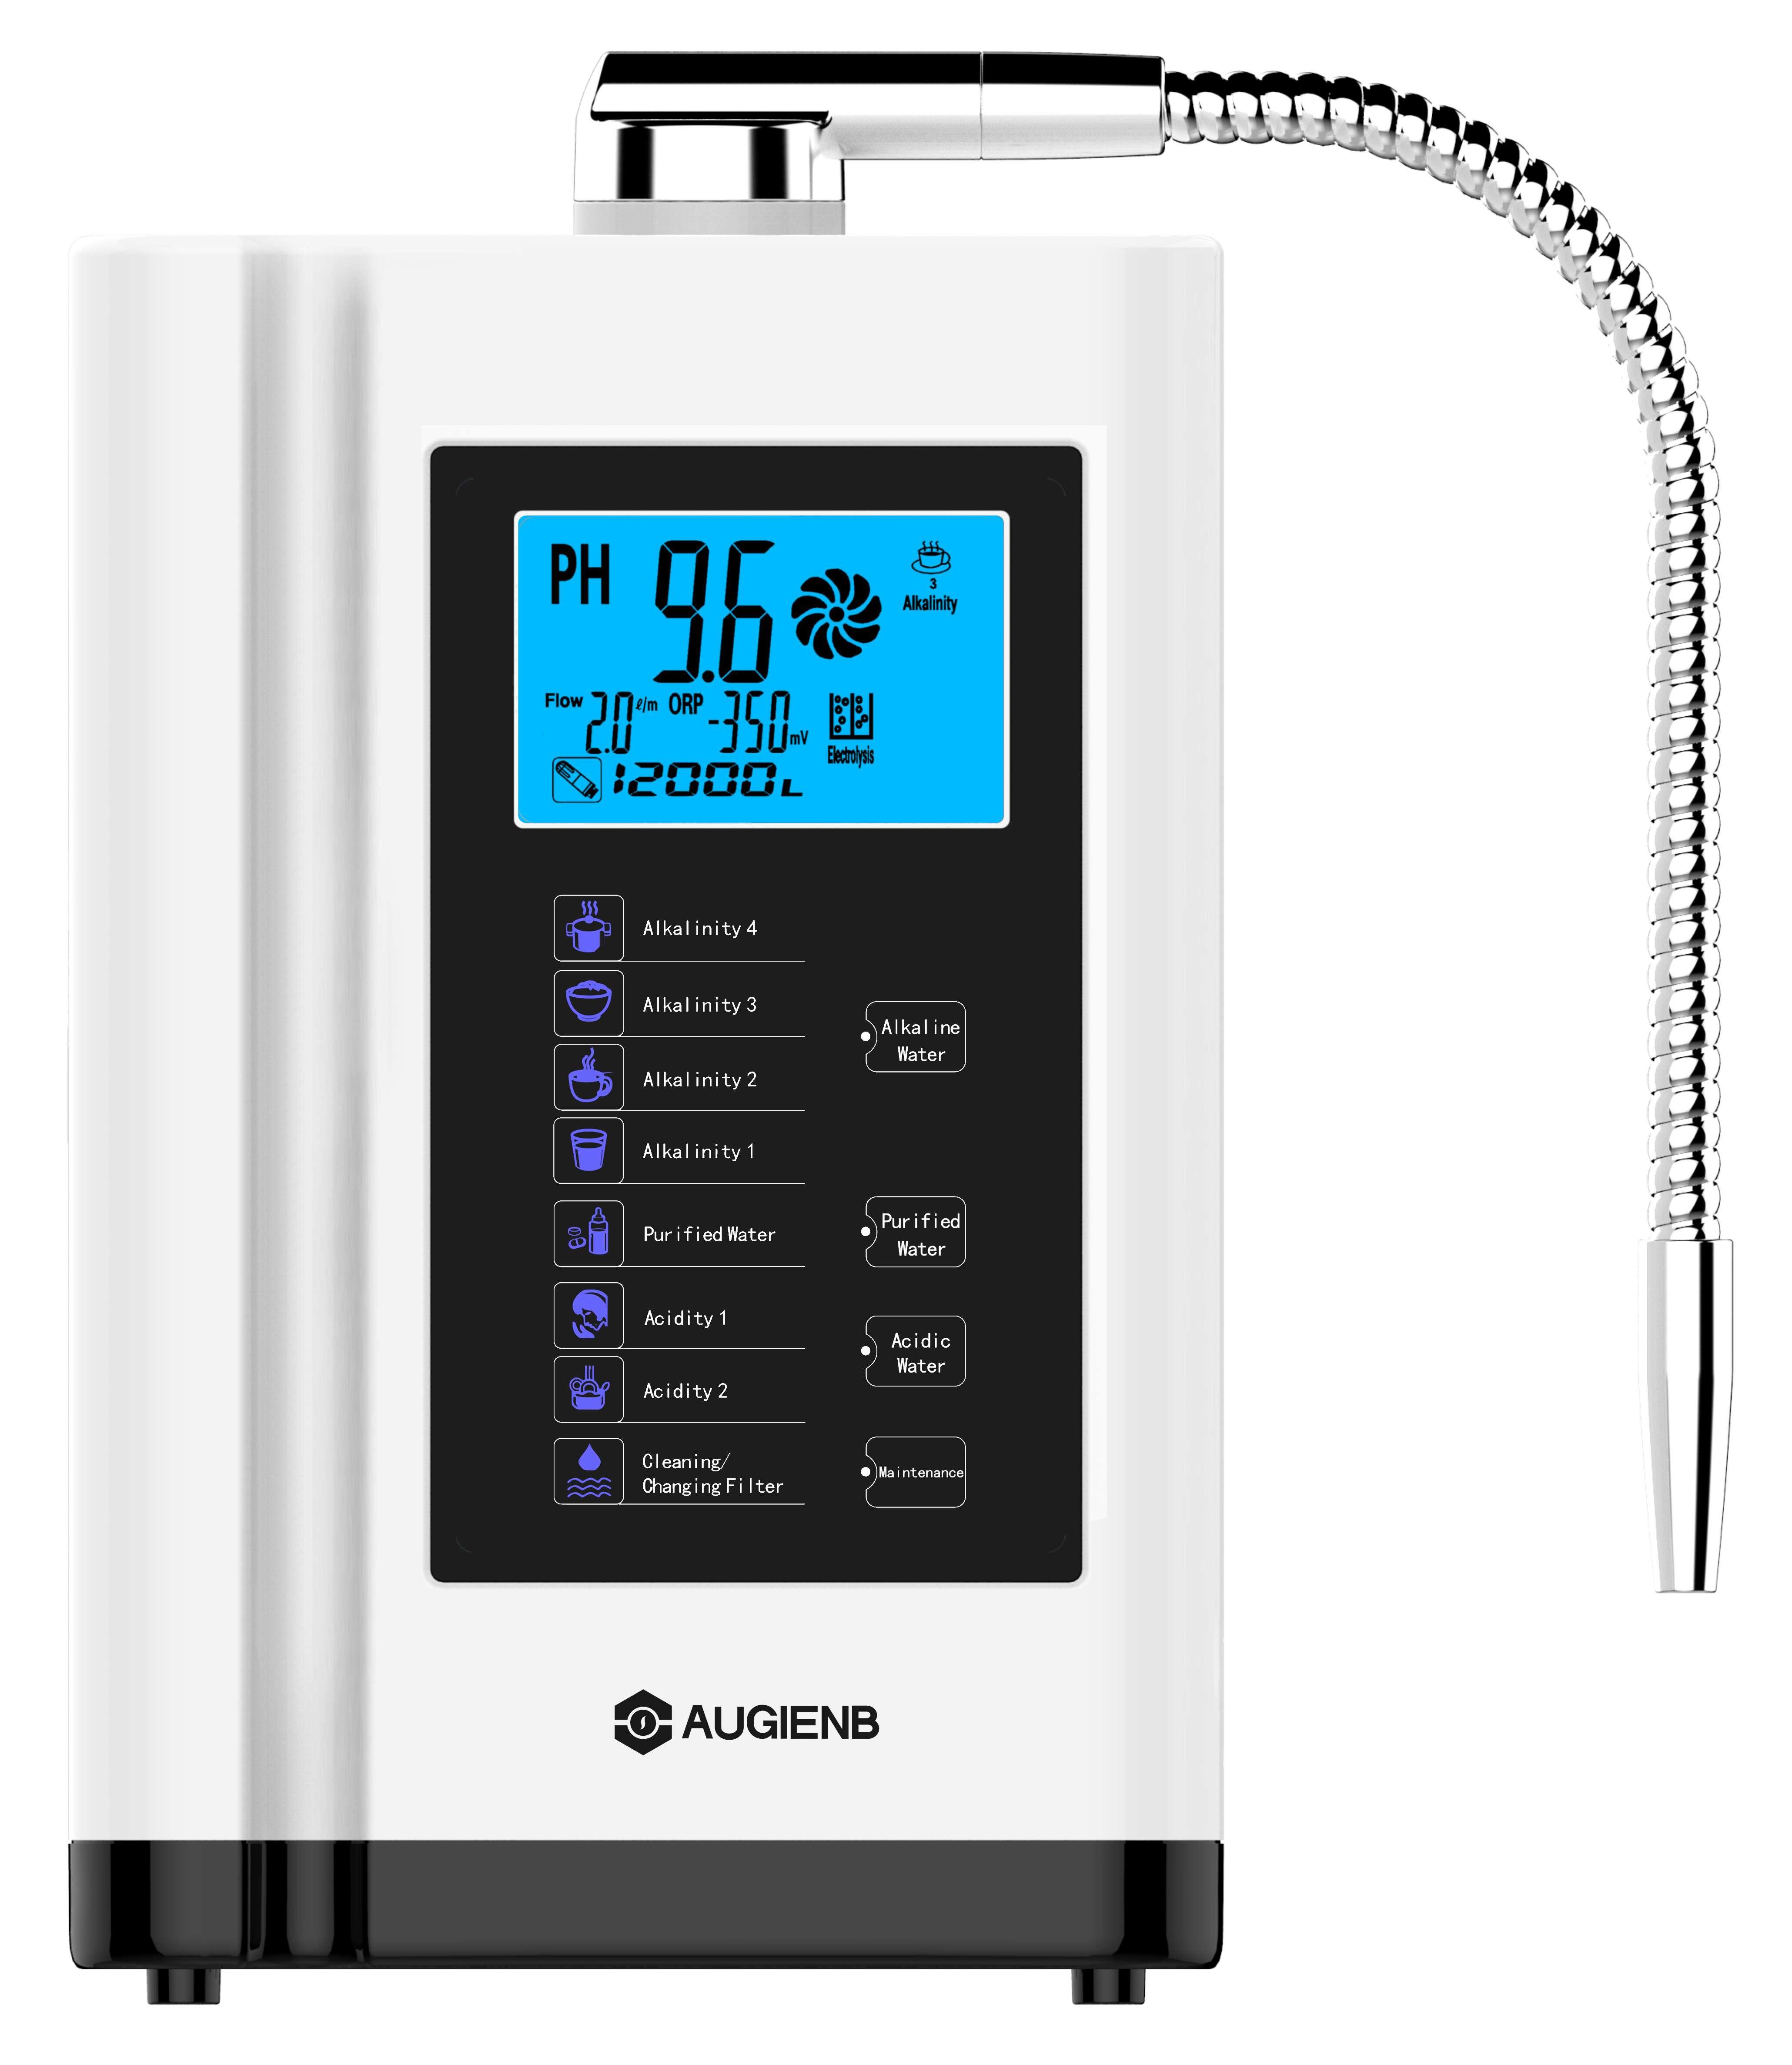 Augienb LCD Touch Control PH3.5-10.5 ácido alcalino máquina 6000L filtro de agua Auto-limpieza ionizador purificador de agua